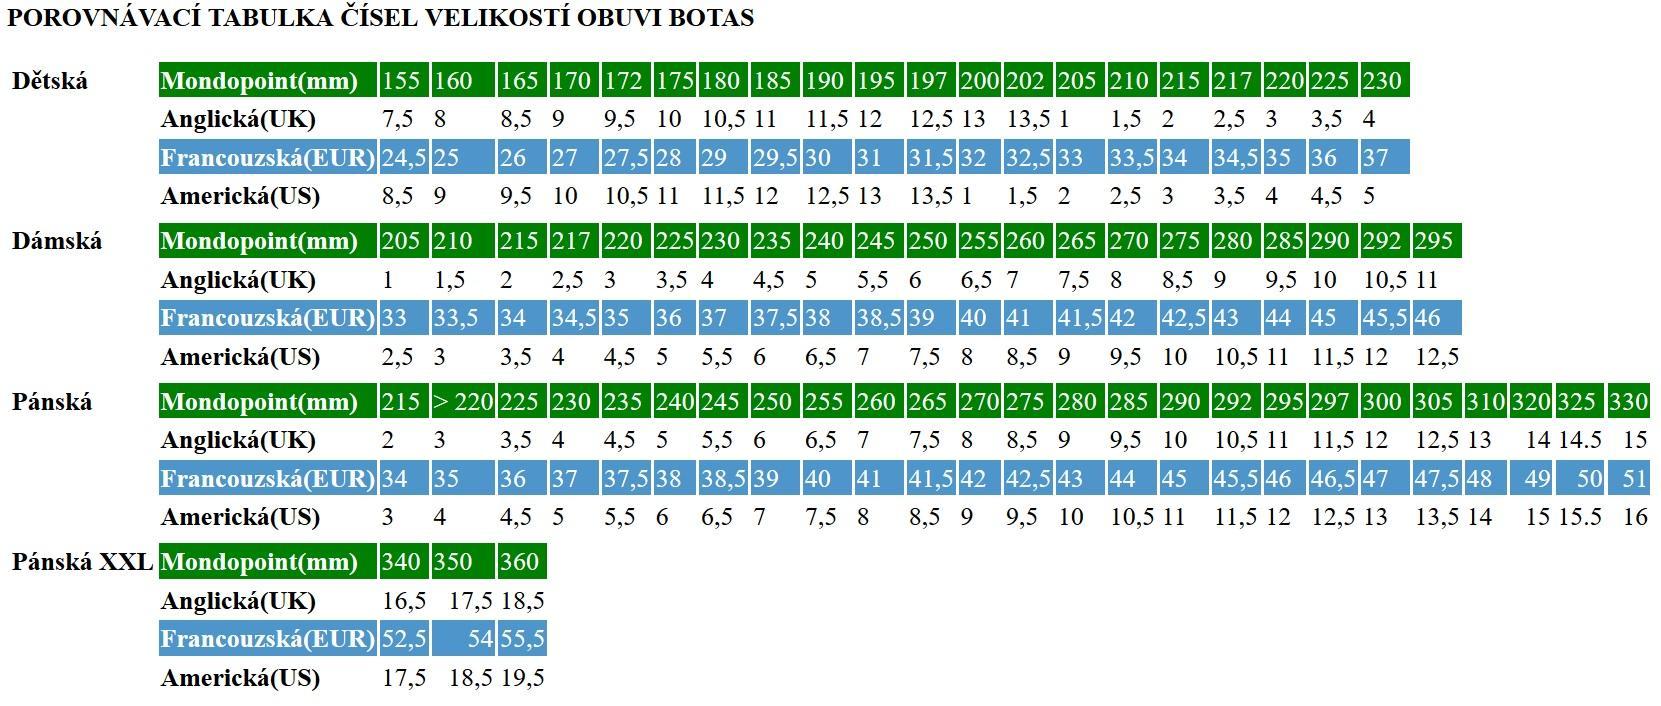 Běžkové boty Botas Altona NN 75 (35-49) - Manvel.cz db449fdd02